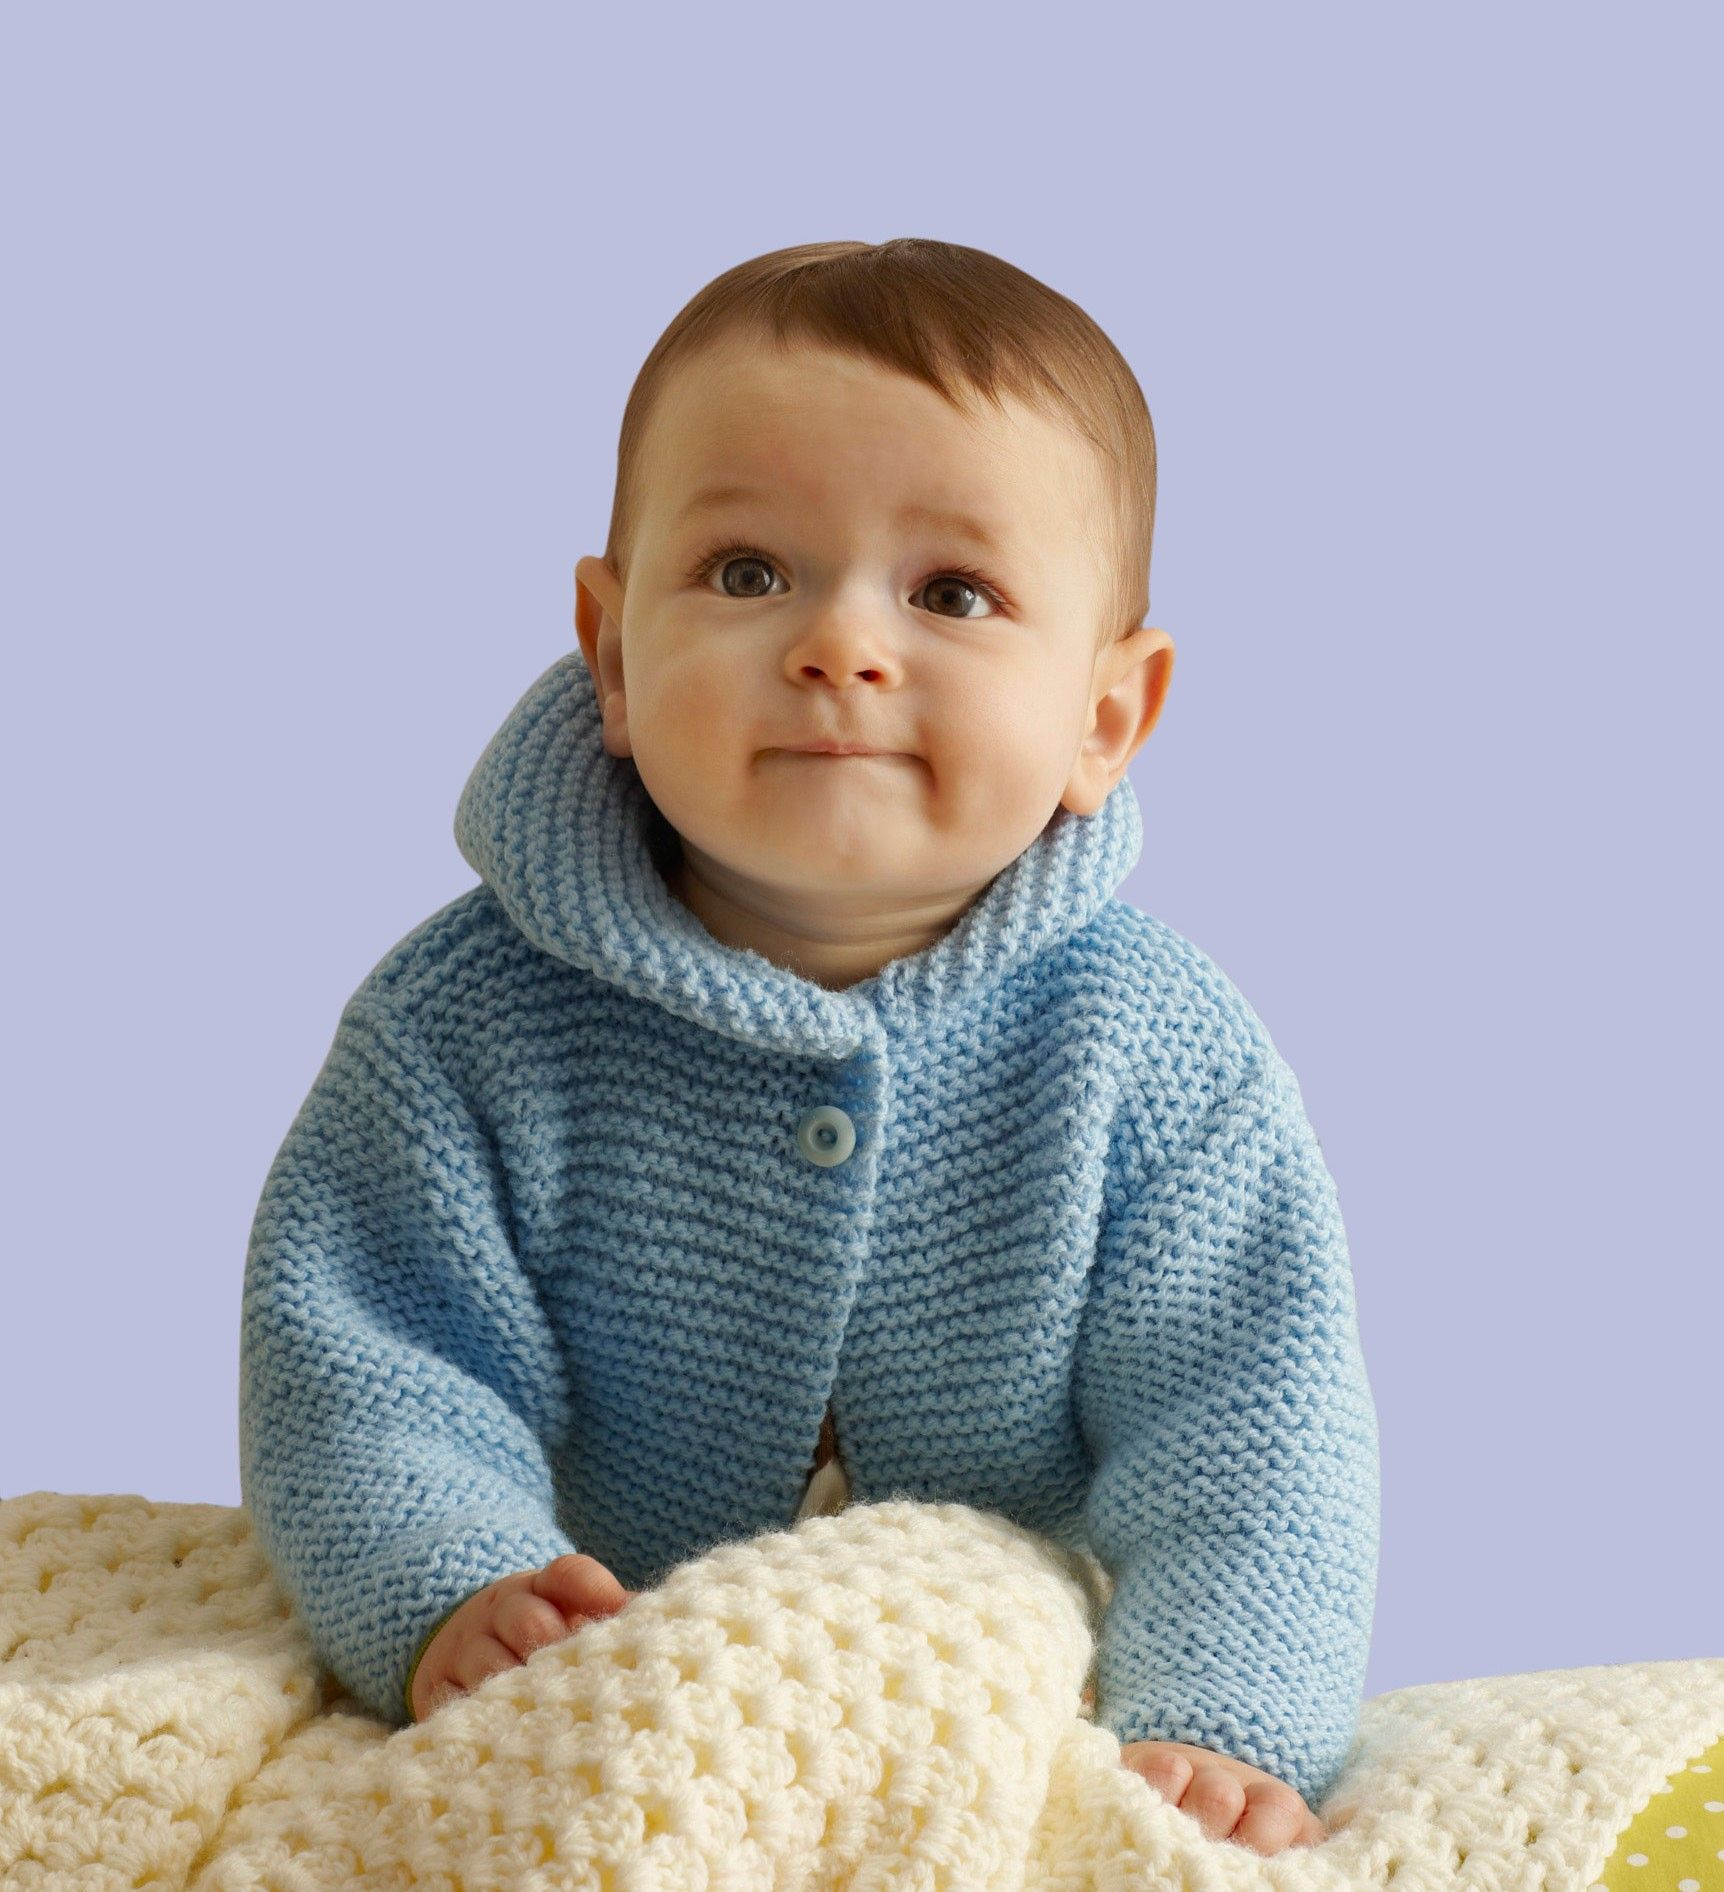 Storybook Baby Hoodie Pattern (Knit)   Knit - child   Pinterest